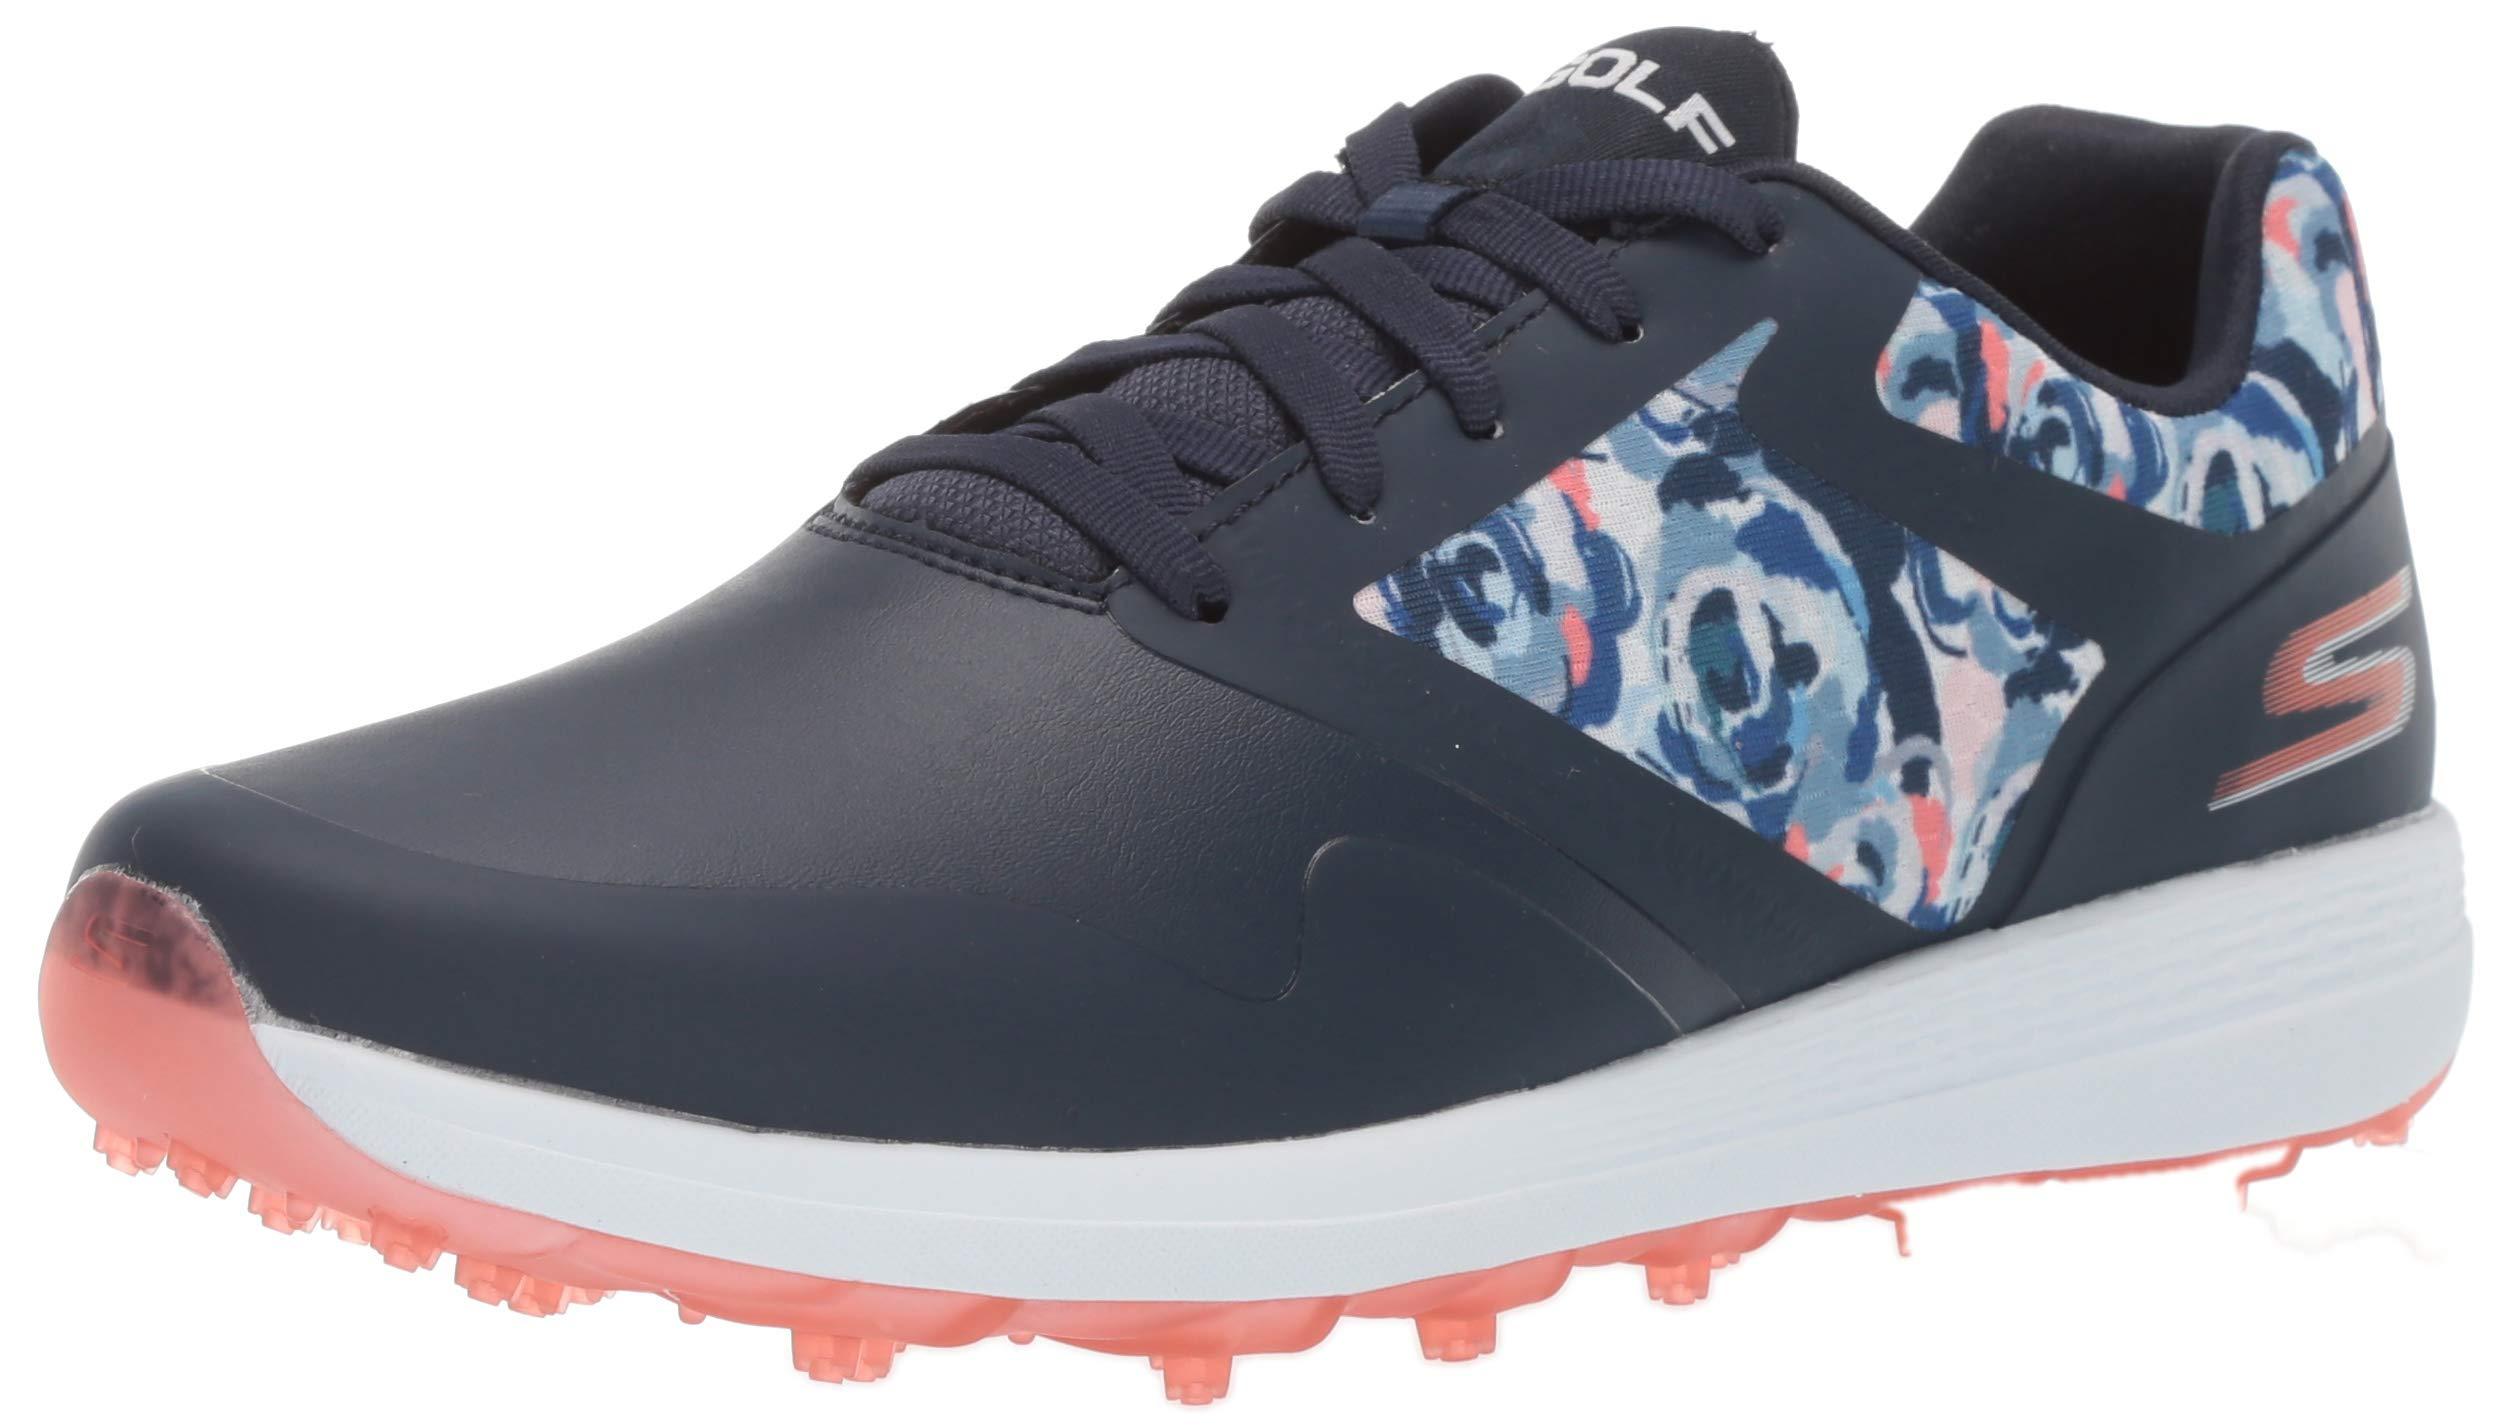 Skechers Women's Max Golf Shoe, Navy/Multi 5.5 M US